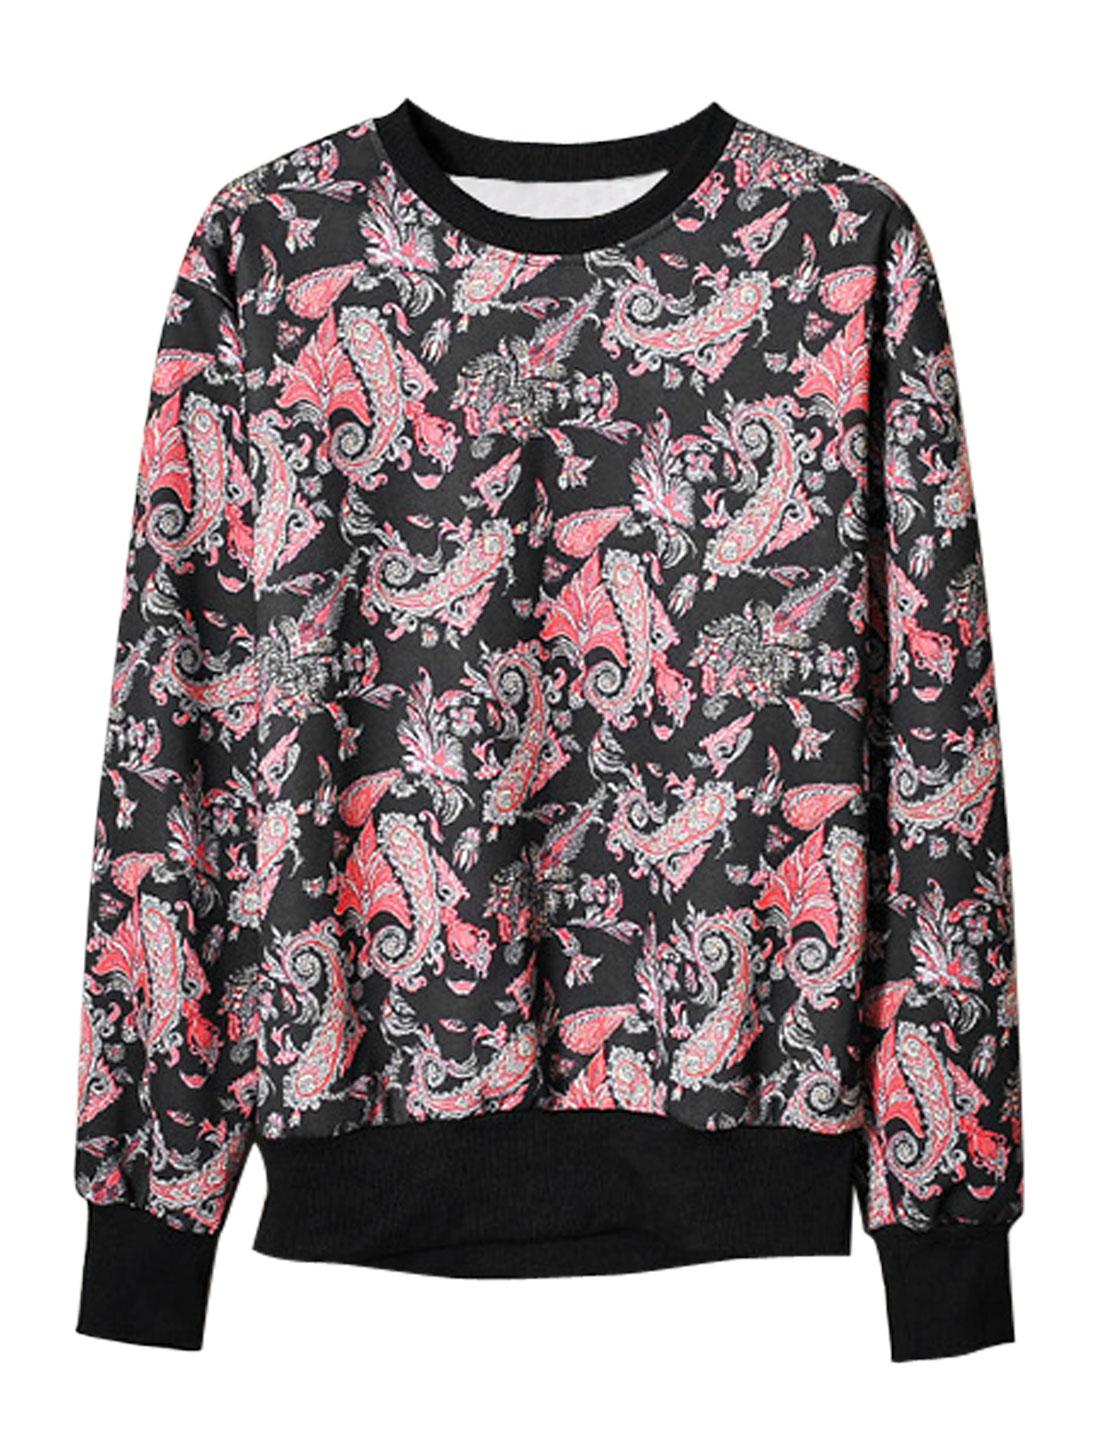 Men Long Sleeeve Paisleys Pattern Casual Design T-Shirt Black M